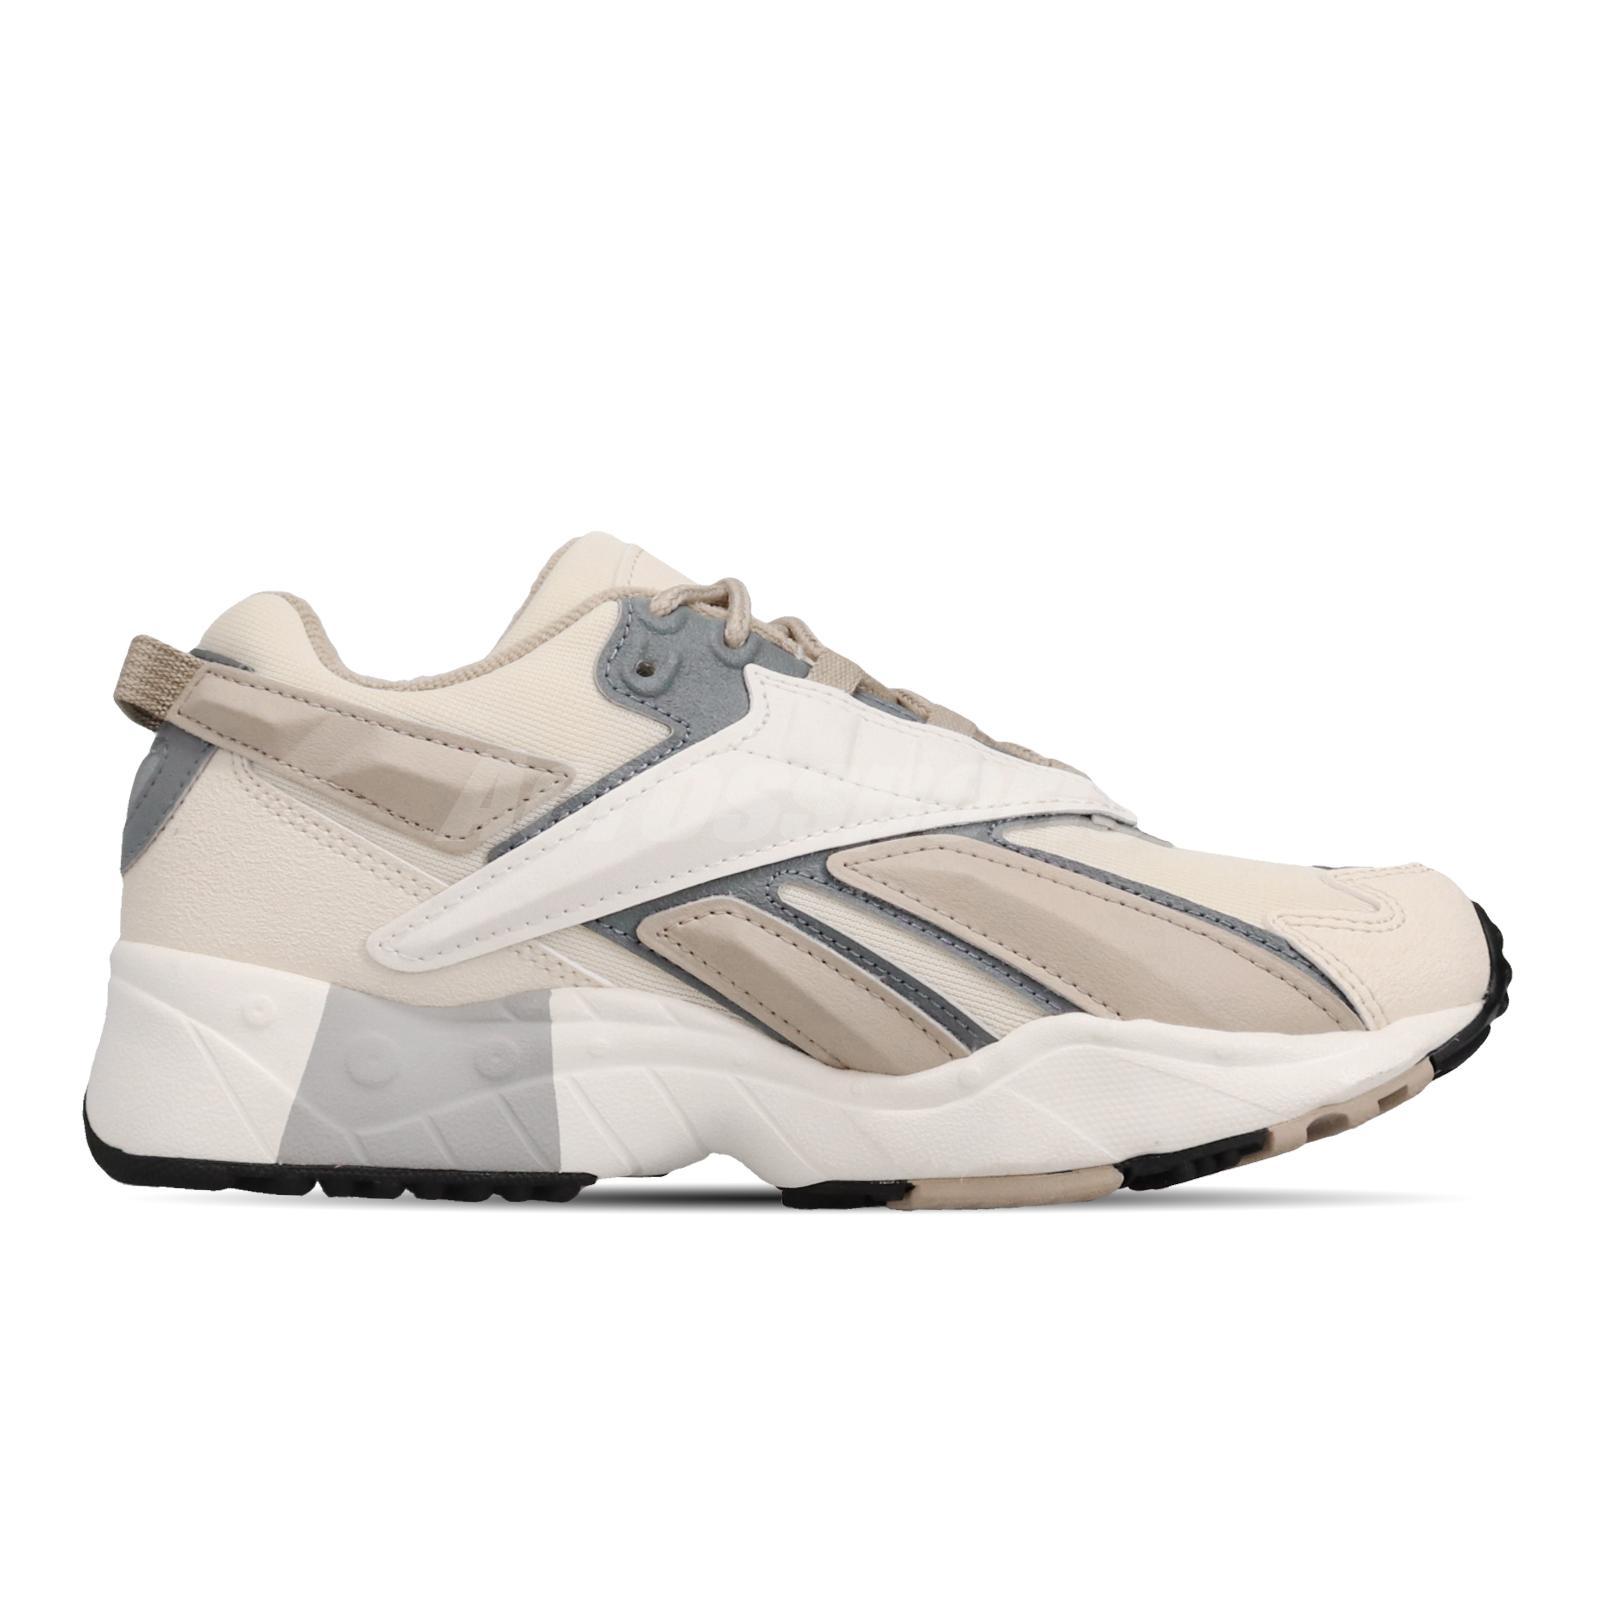 Reebok INTV 96 Chalk White Beige Mens Womens Retro Running Shoes Big Logo FV6305